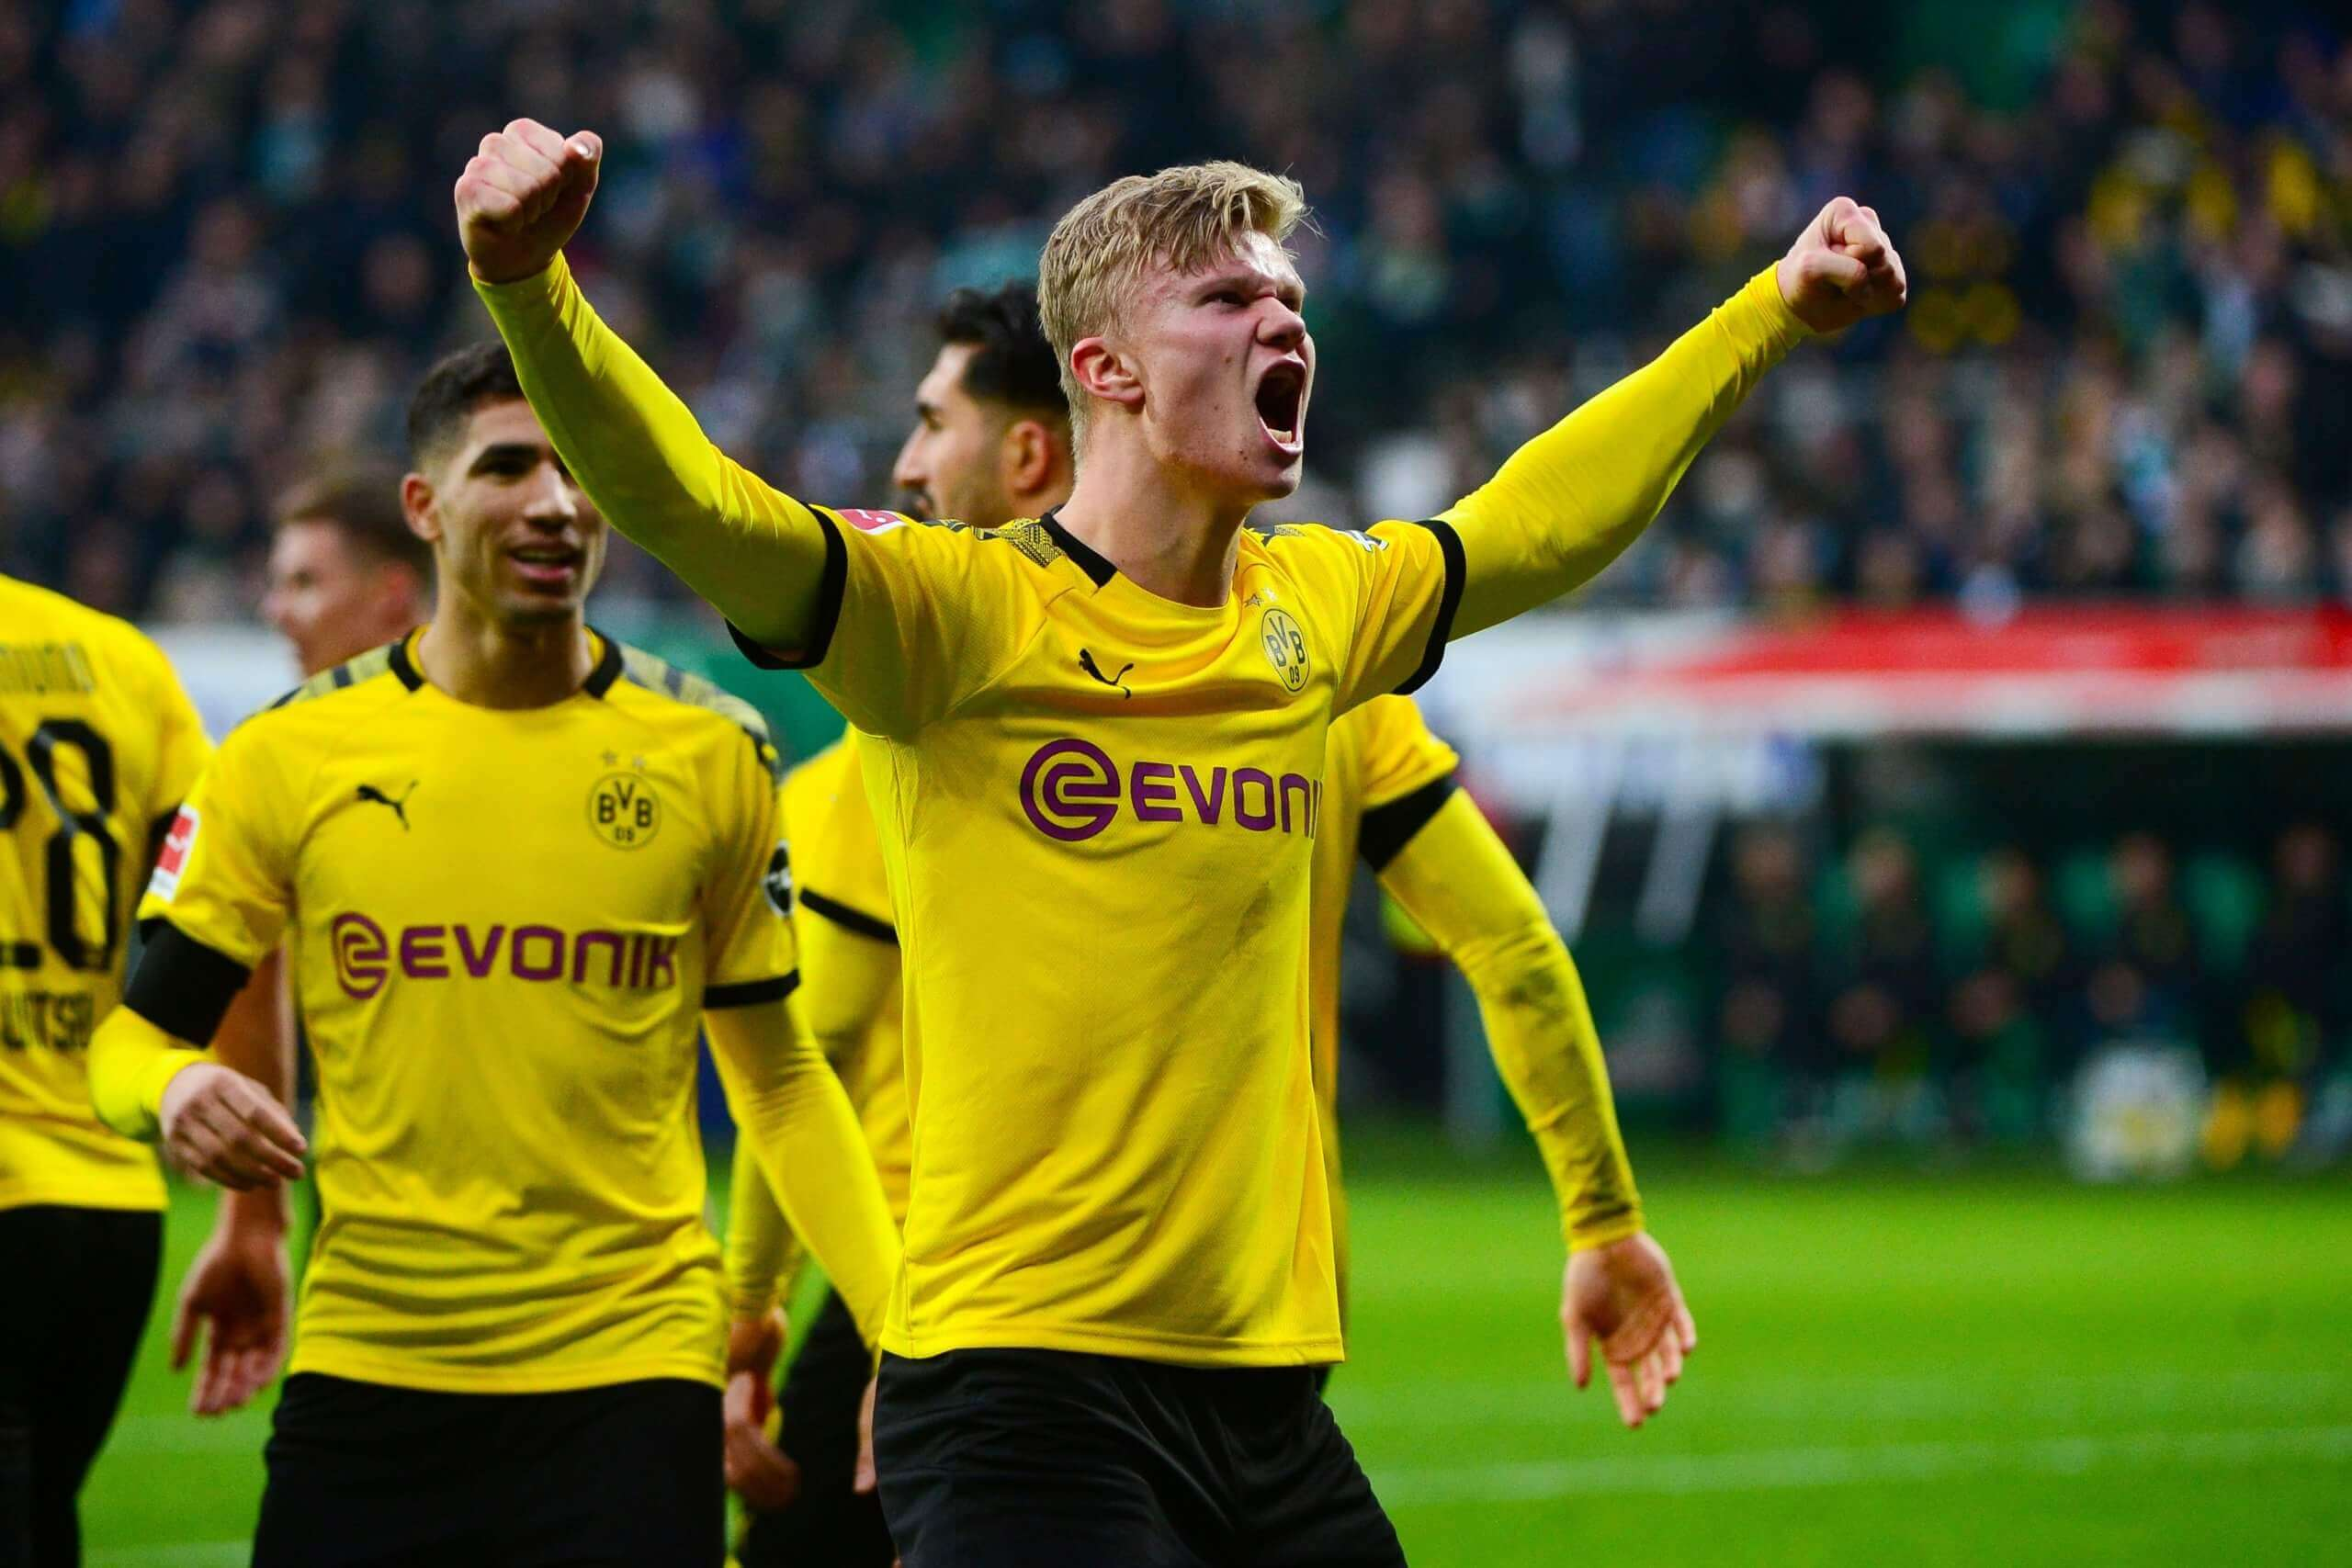 The Klassiker: Borussia Dortmund v. FC Bayern Munich